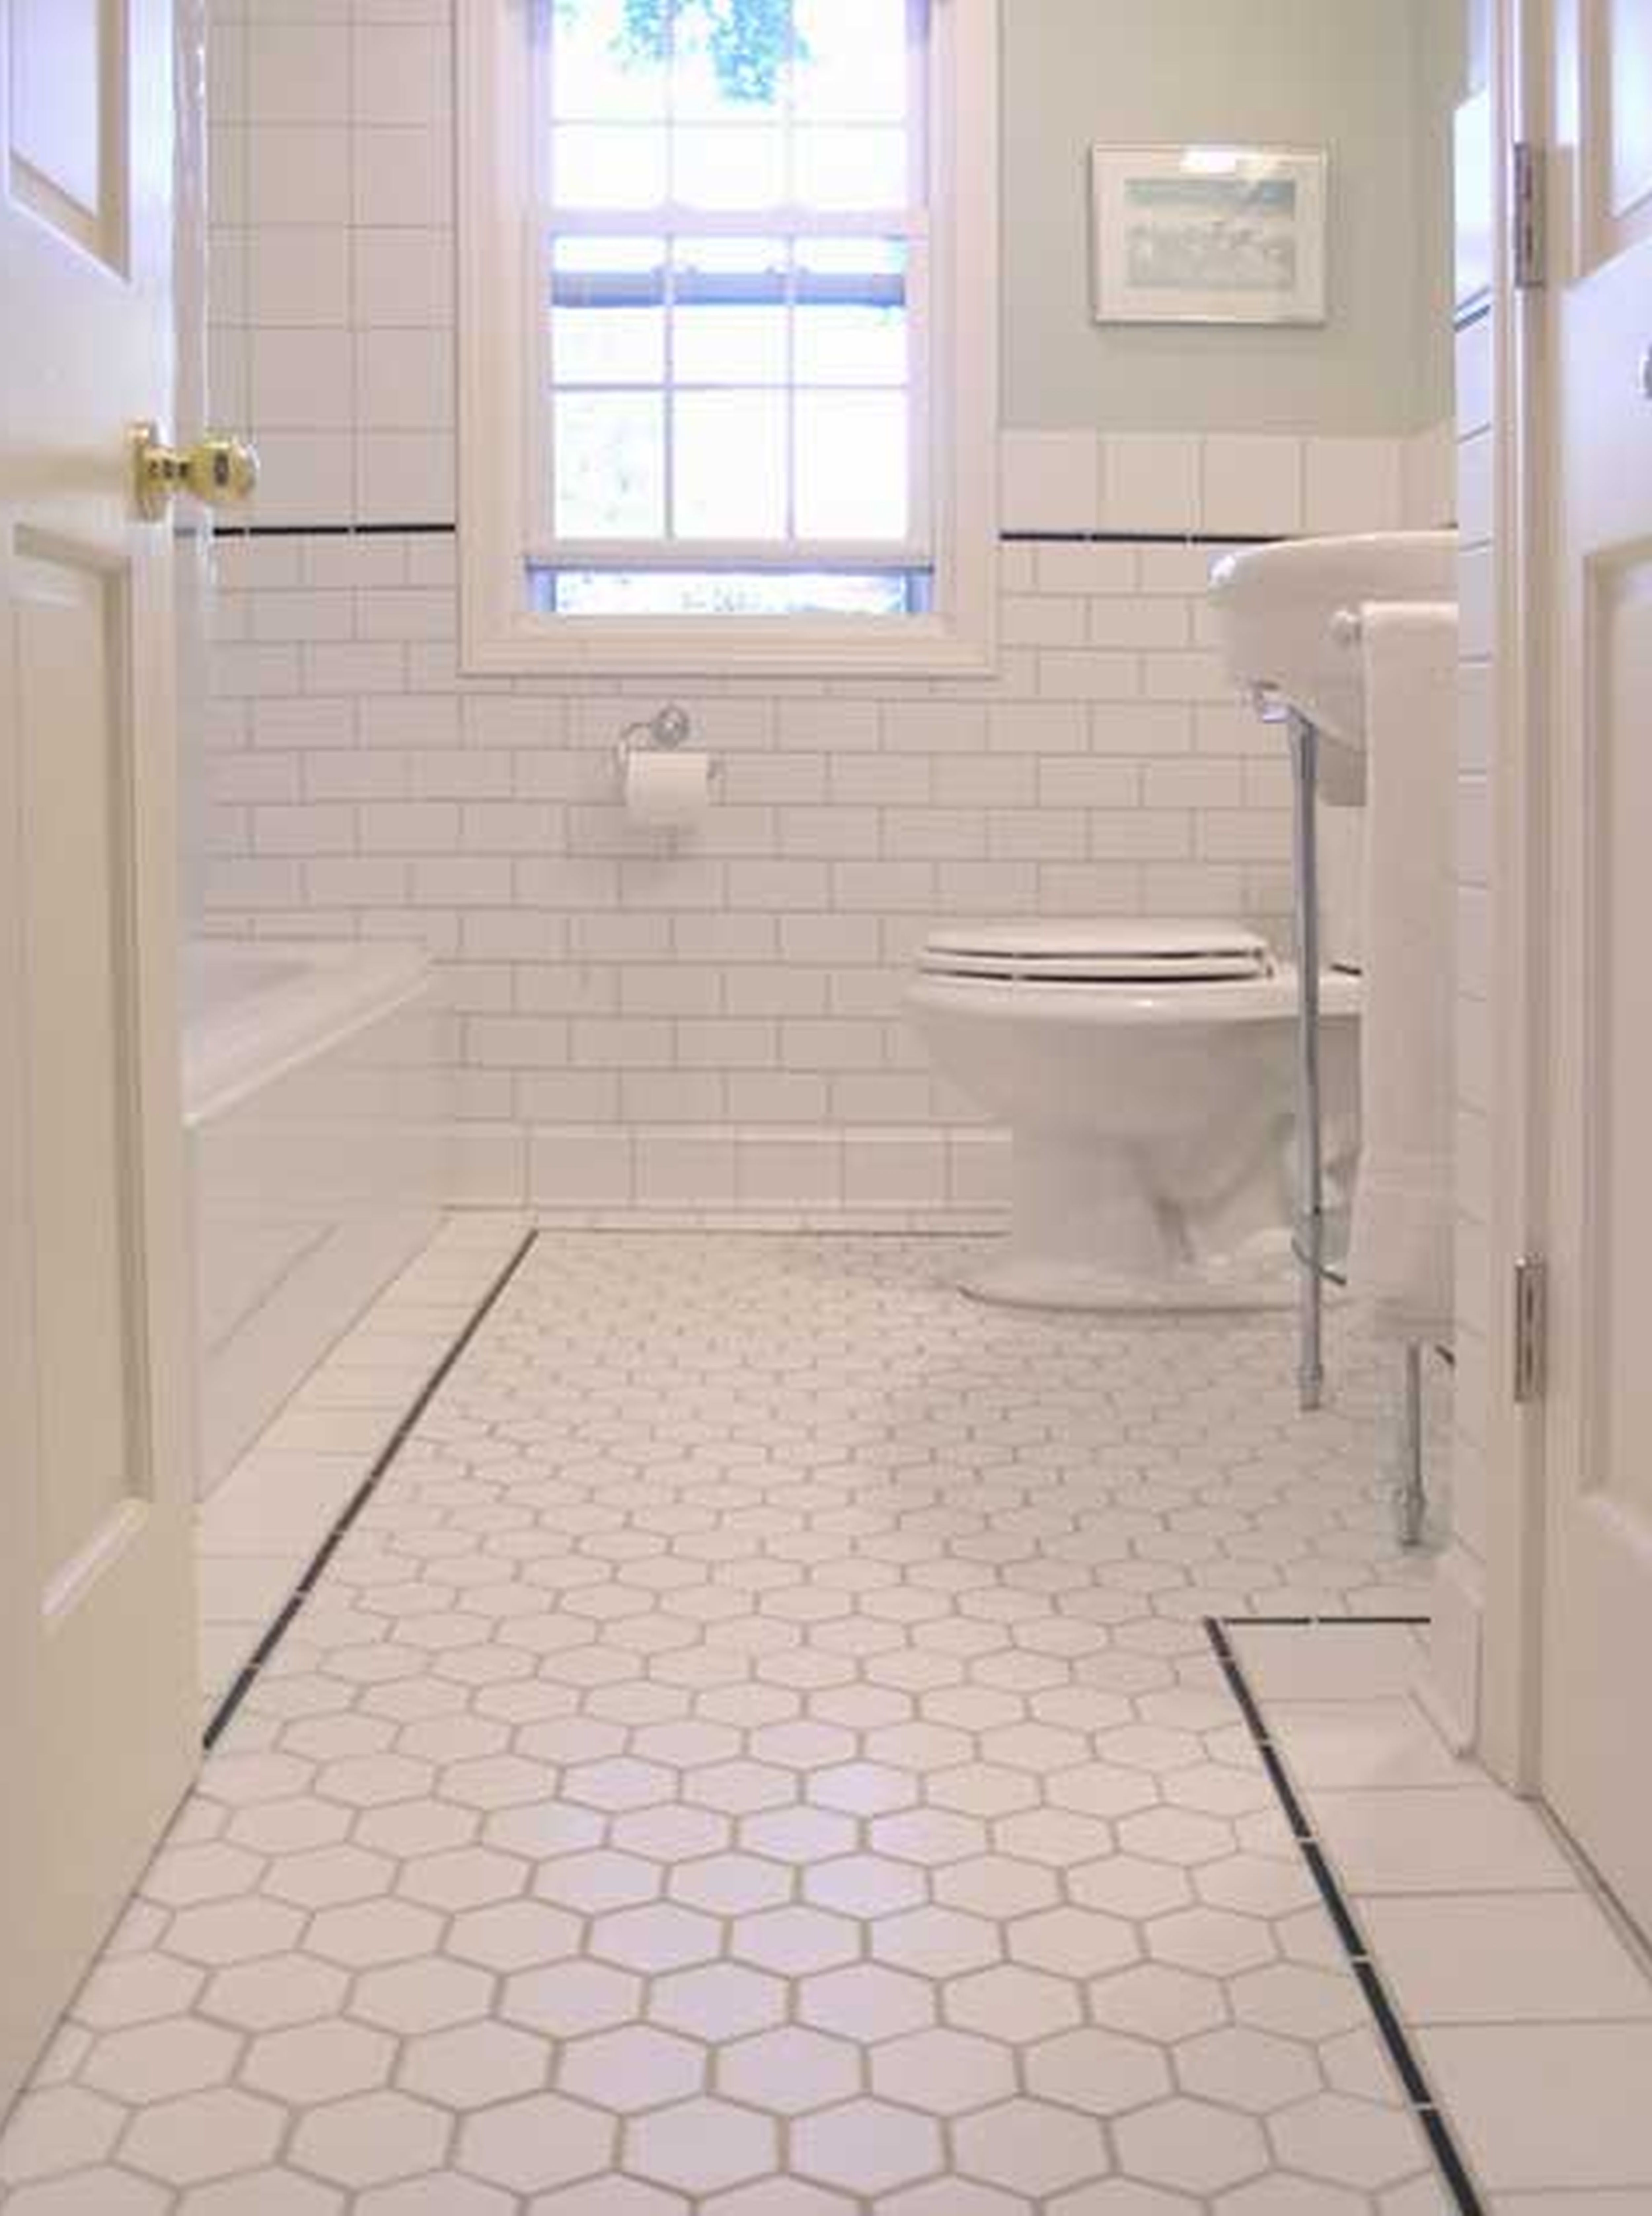 36 nice ideas and pictures of vintage bathroom tile design ... on Bathroom Tile Pattern Design  id=18942